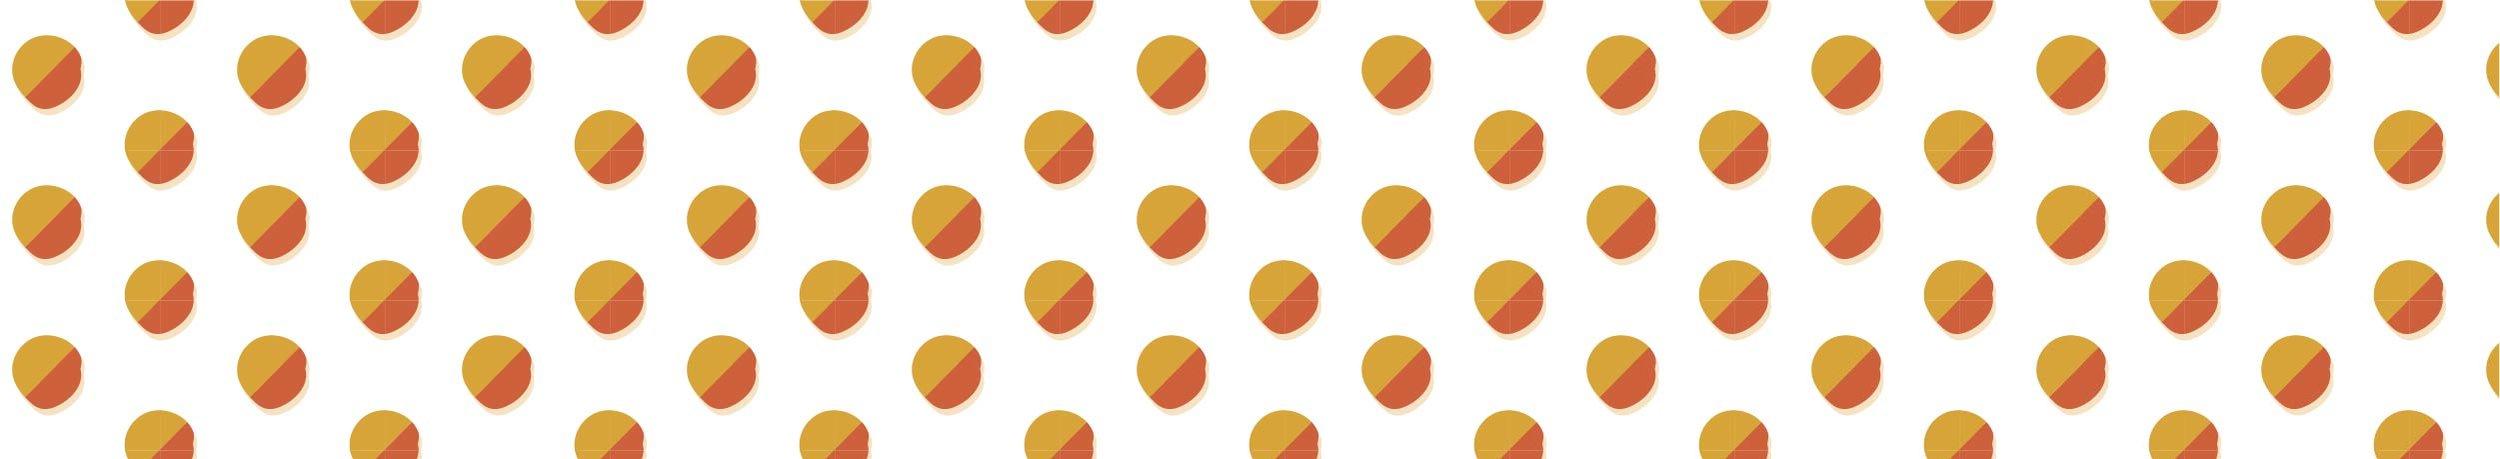 CaseStudyBrandBoard_PizzaTree_1_Intro Pattern.jpg